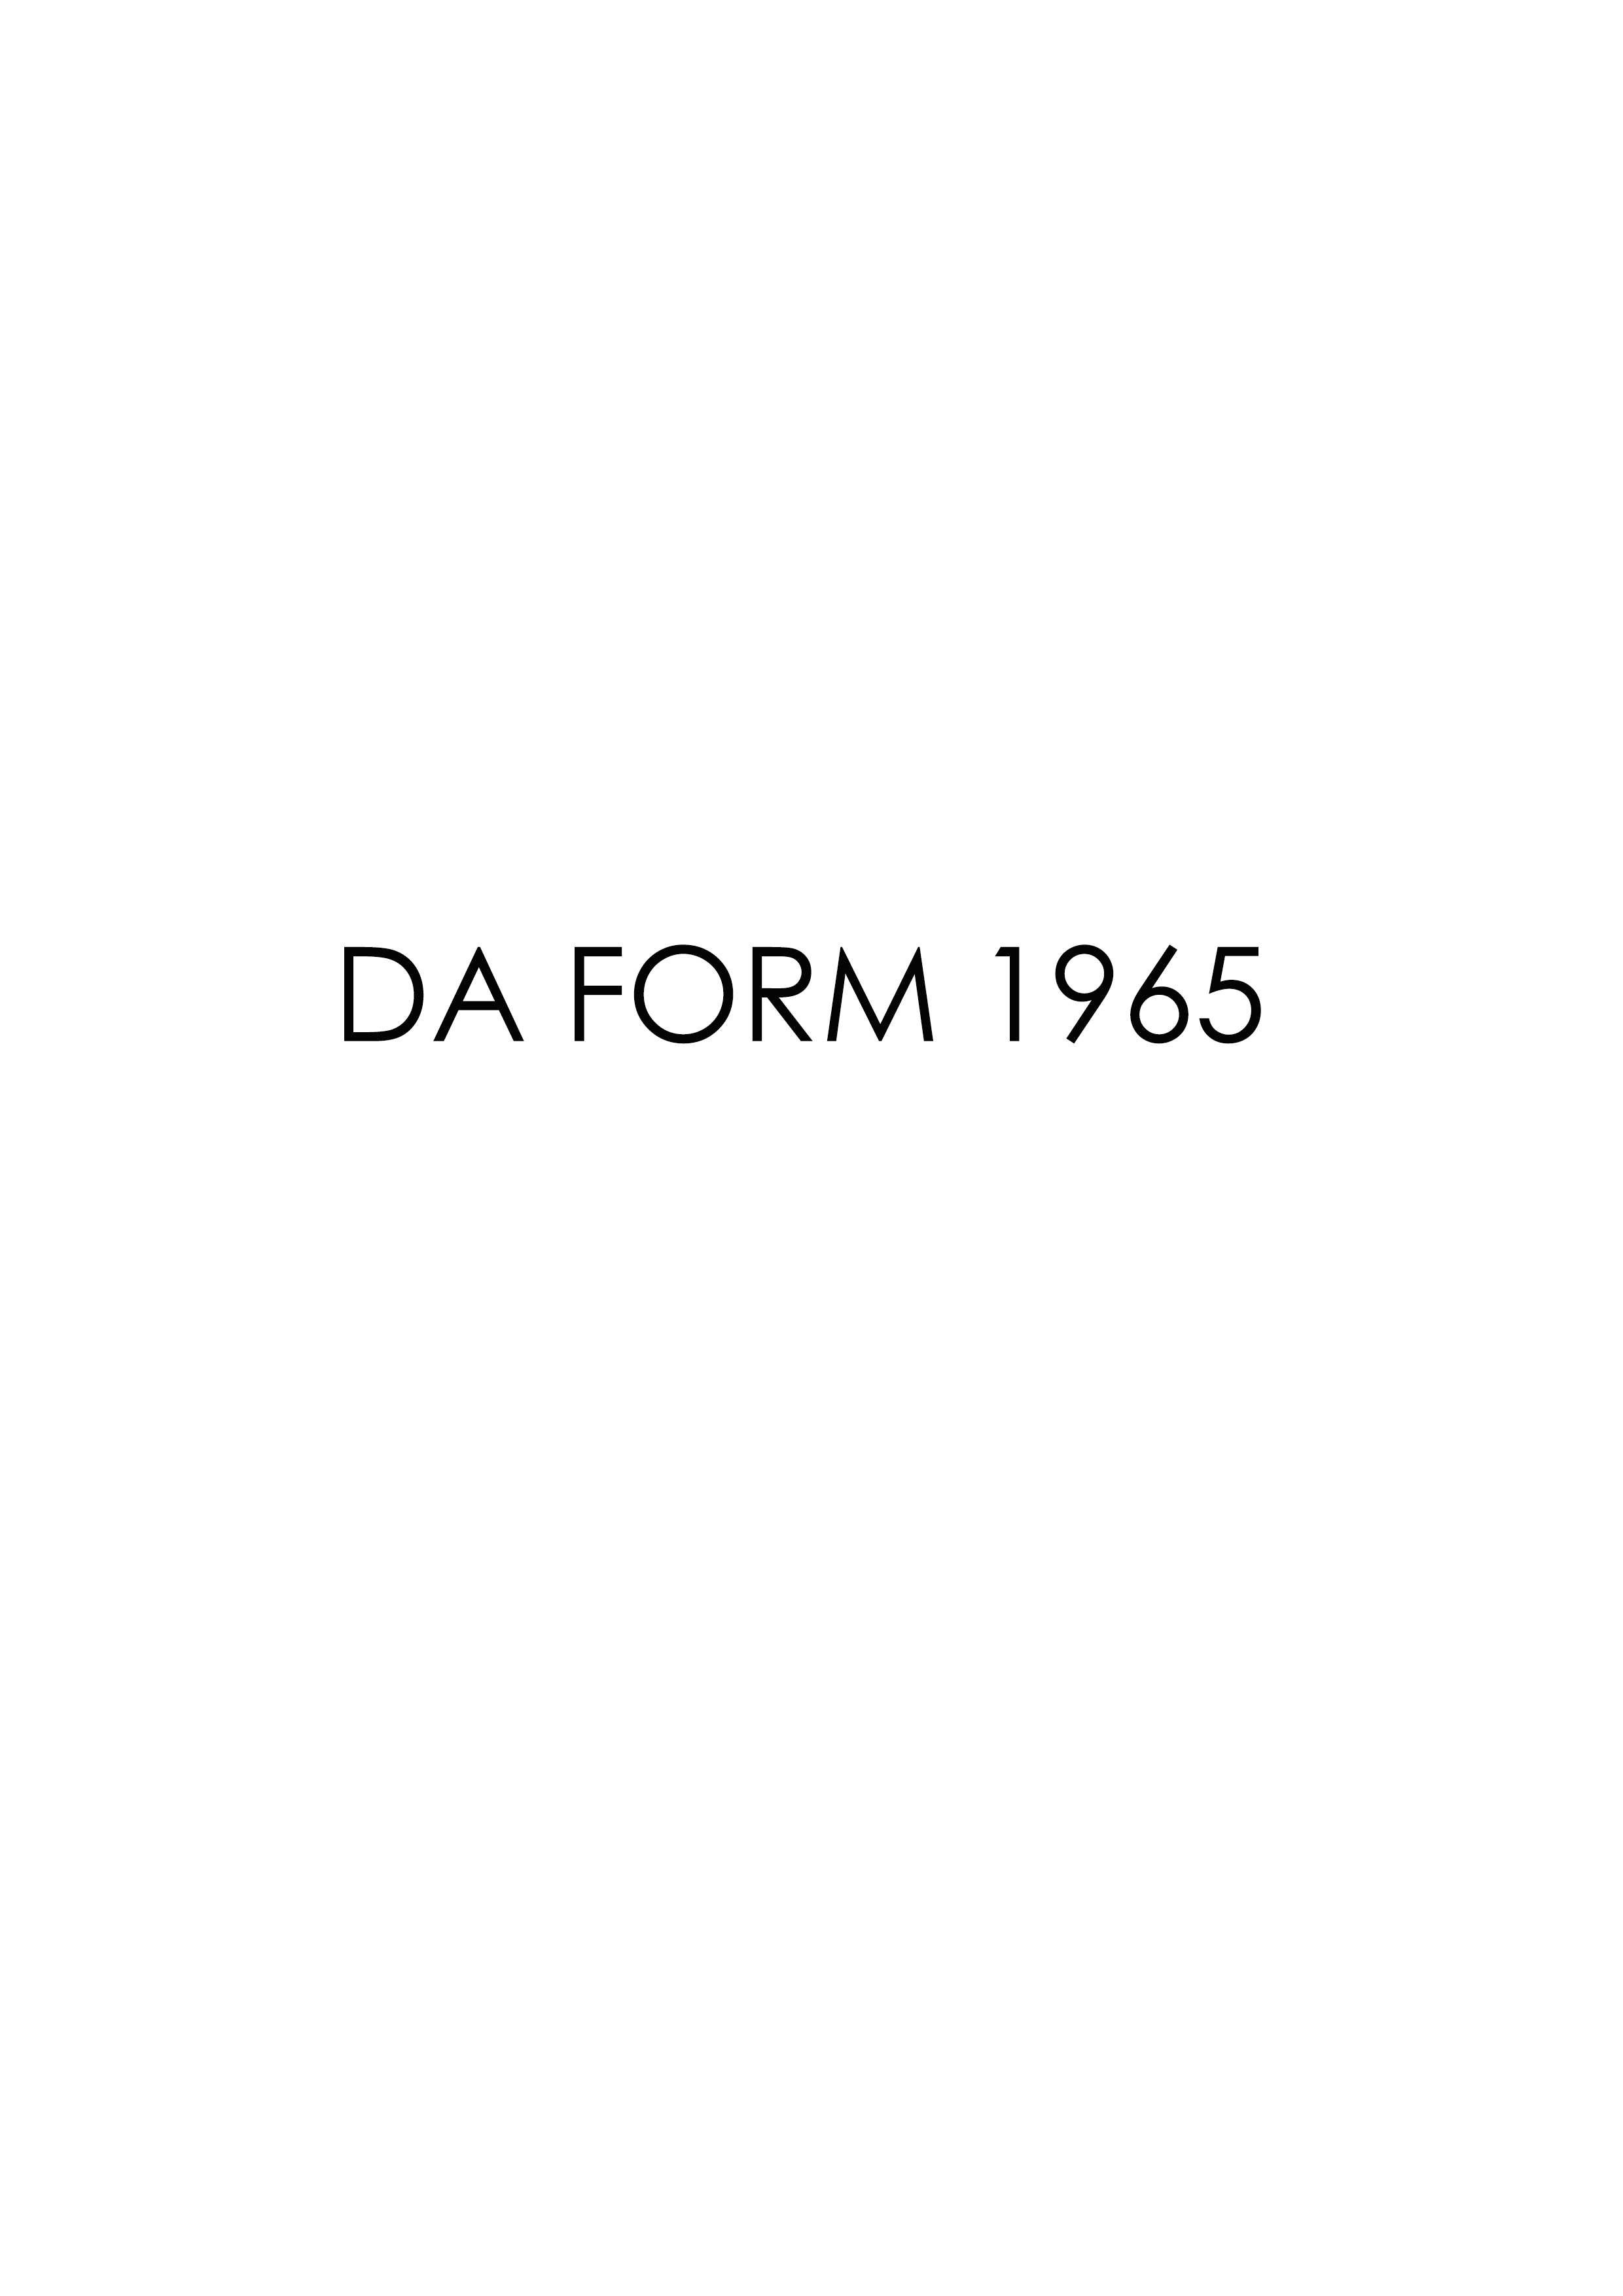 Download da Form 1965 Free